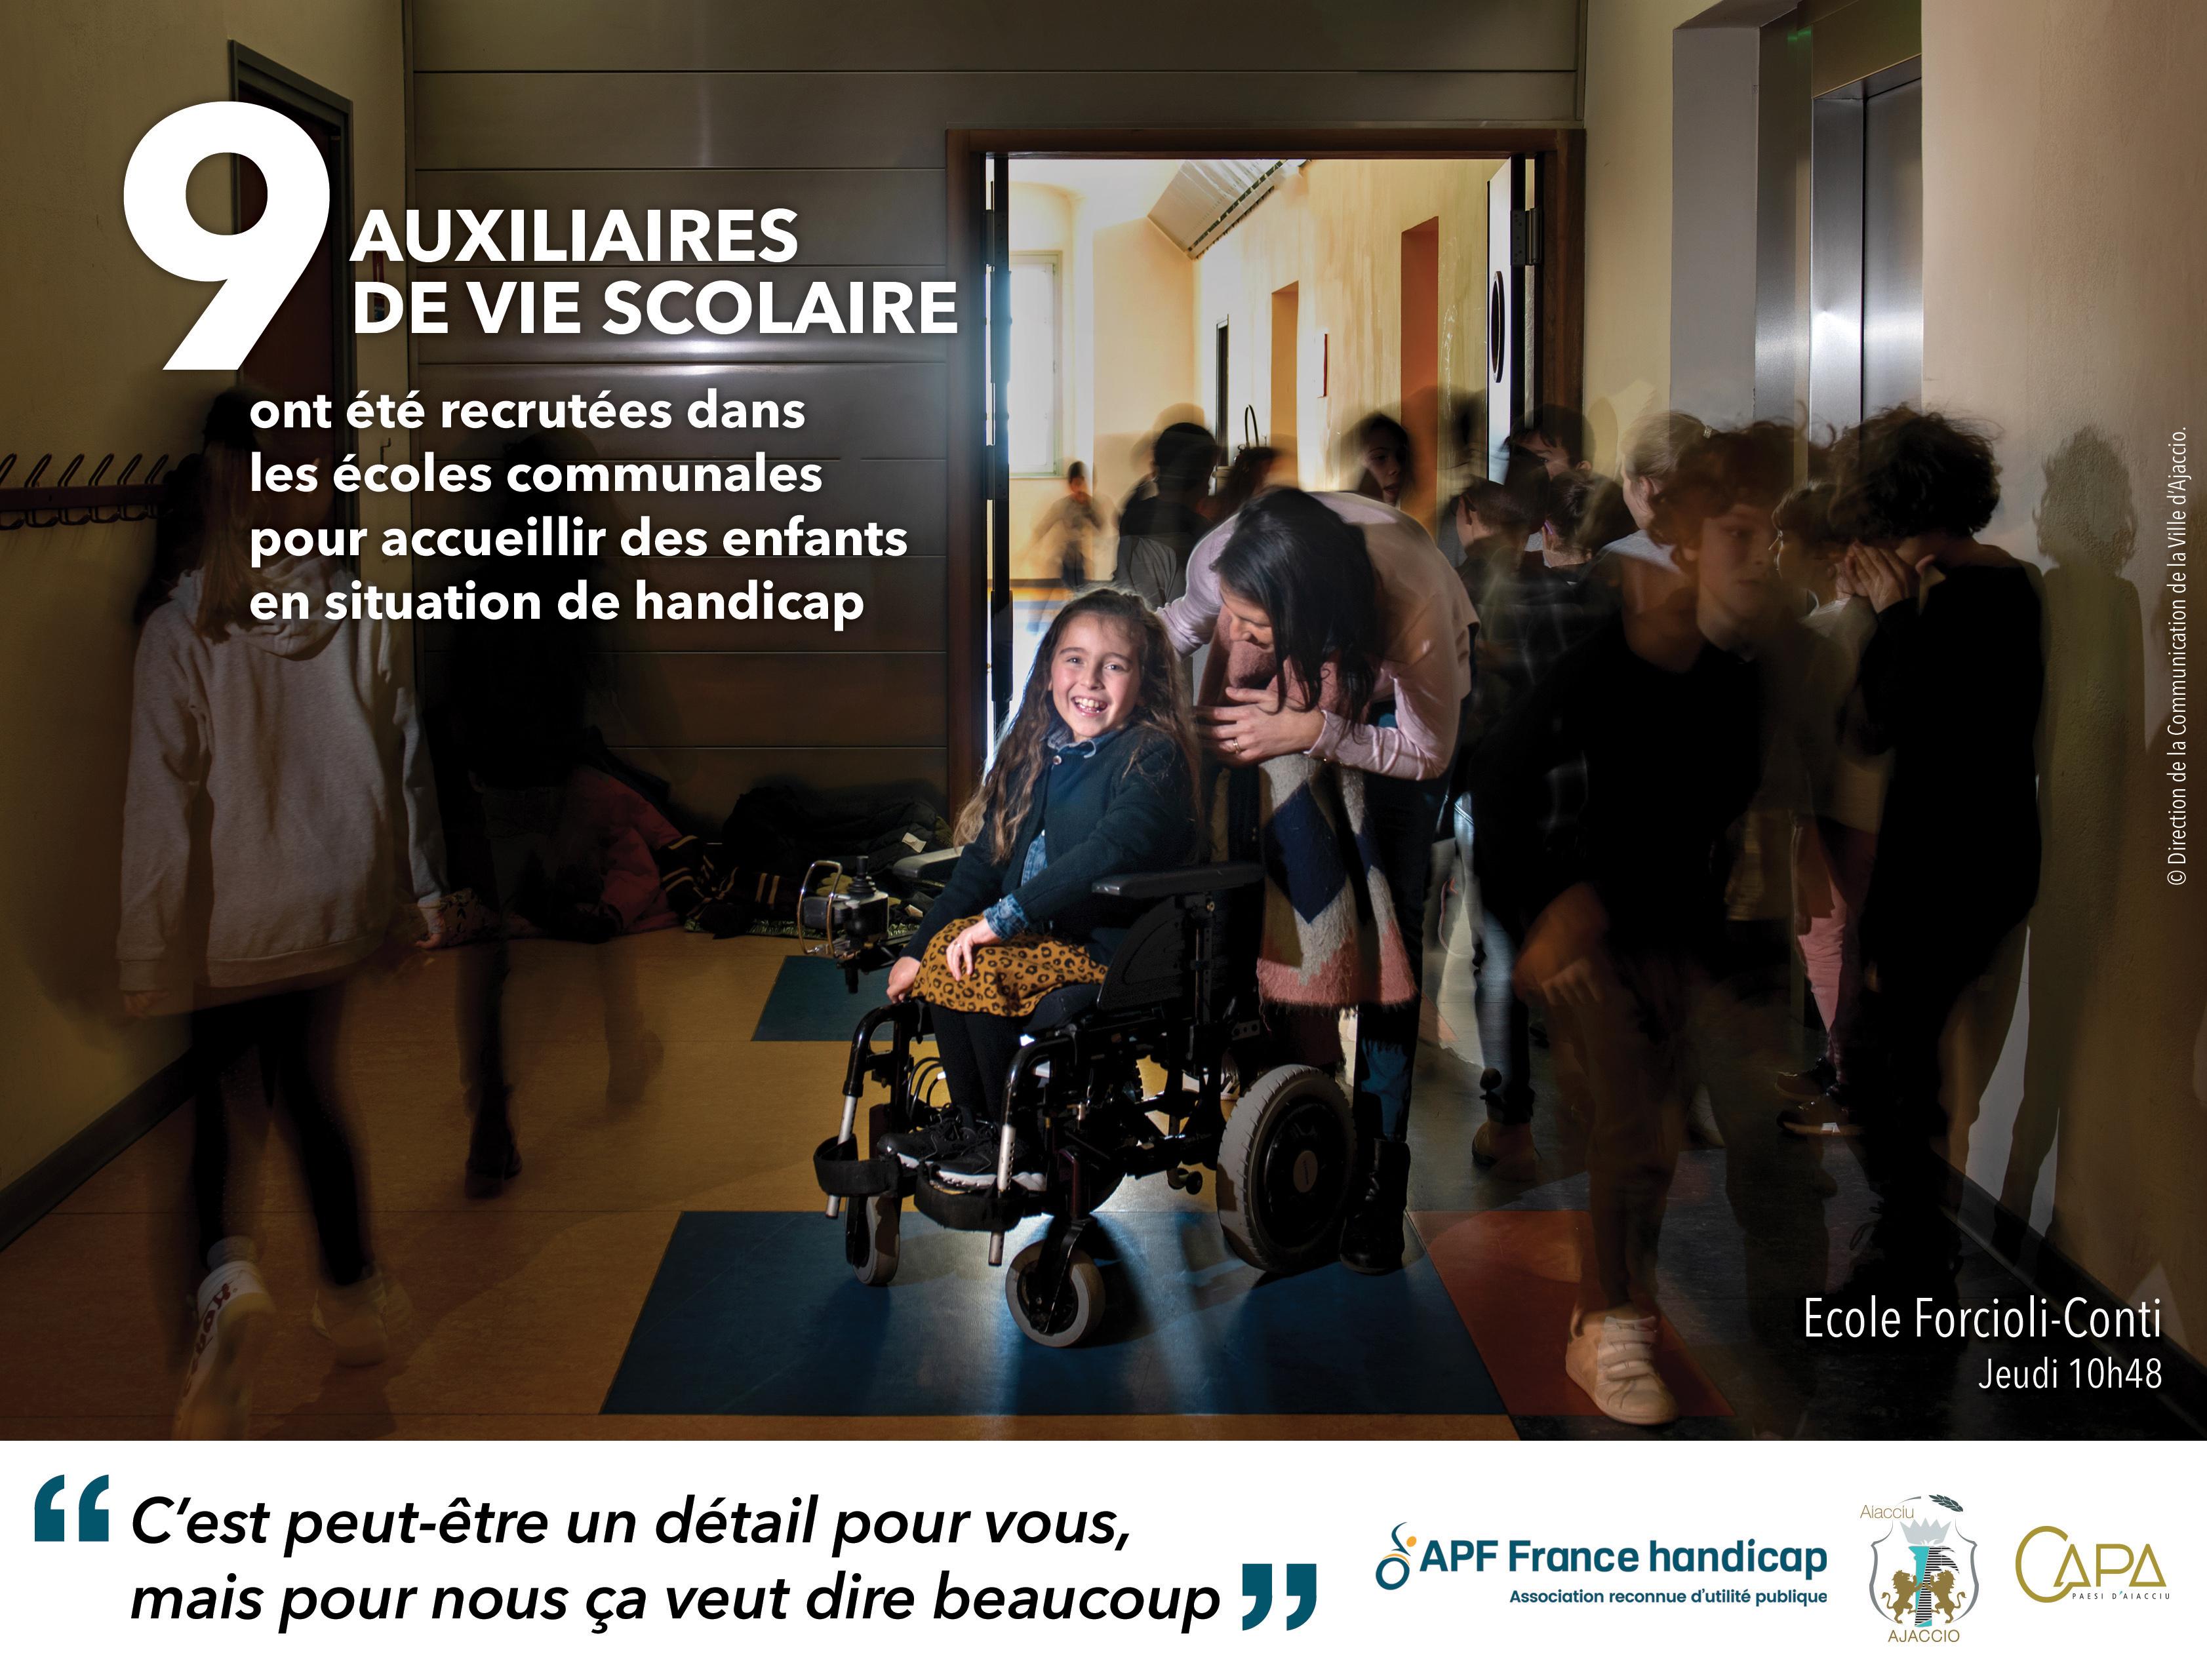 Ajaccio, ville inclusive en faveur du handicap